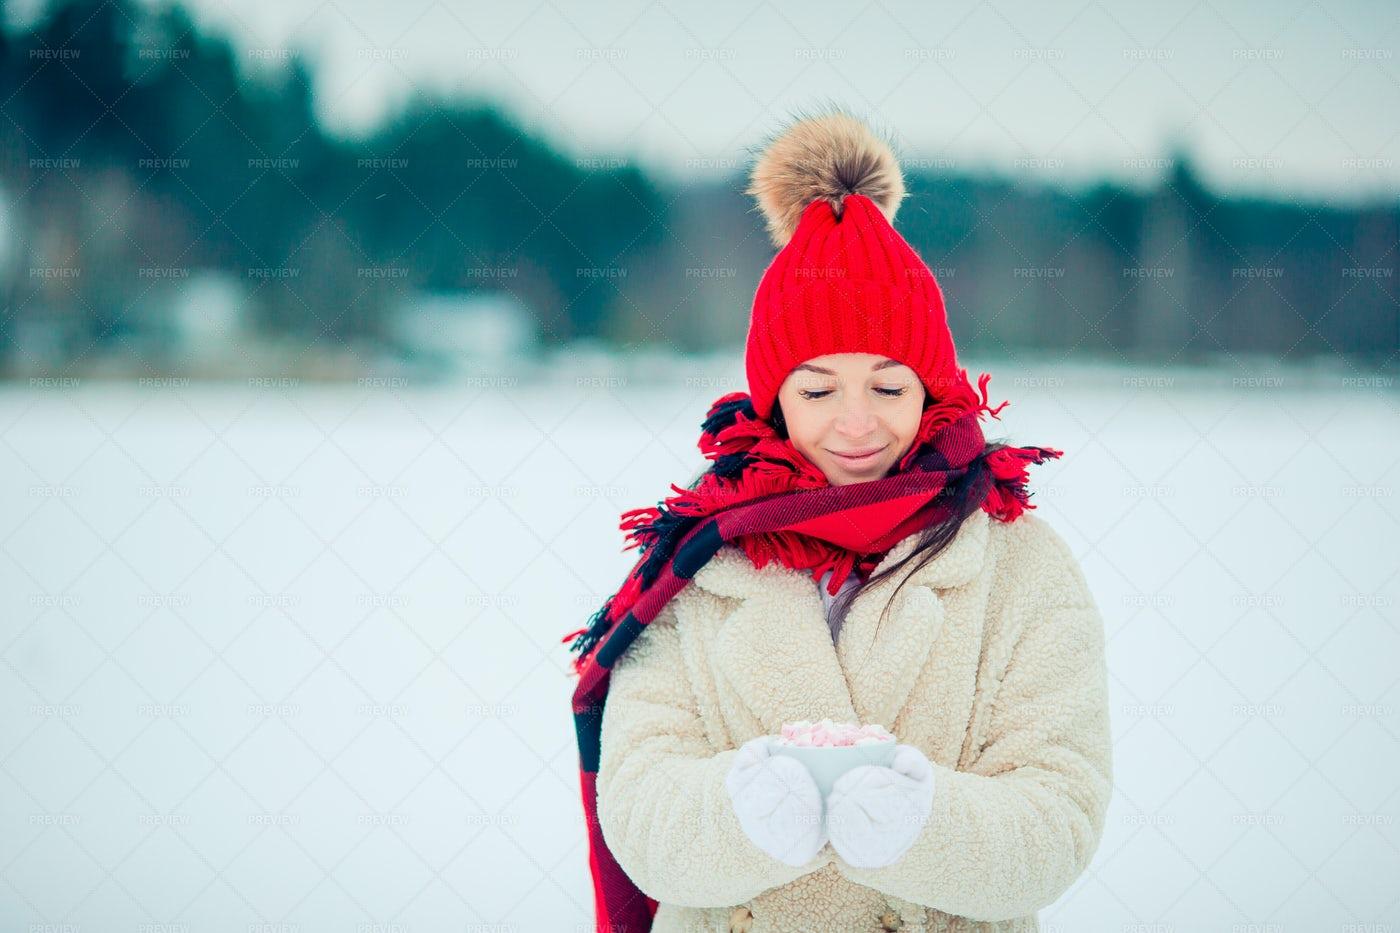 Hot Cocoa On A Cold Day: Stock Photos